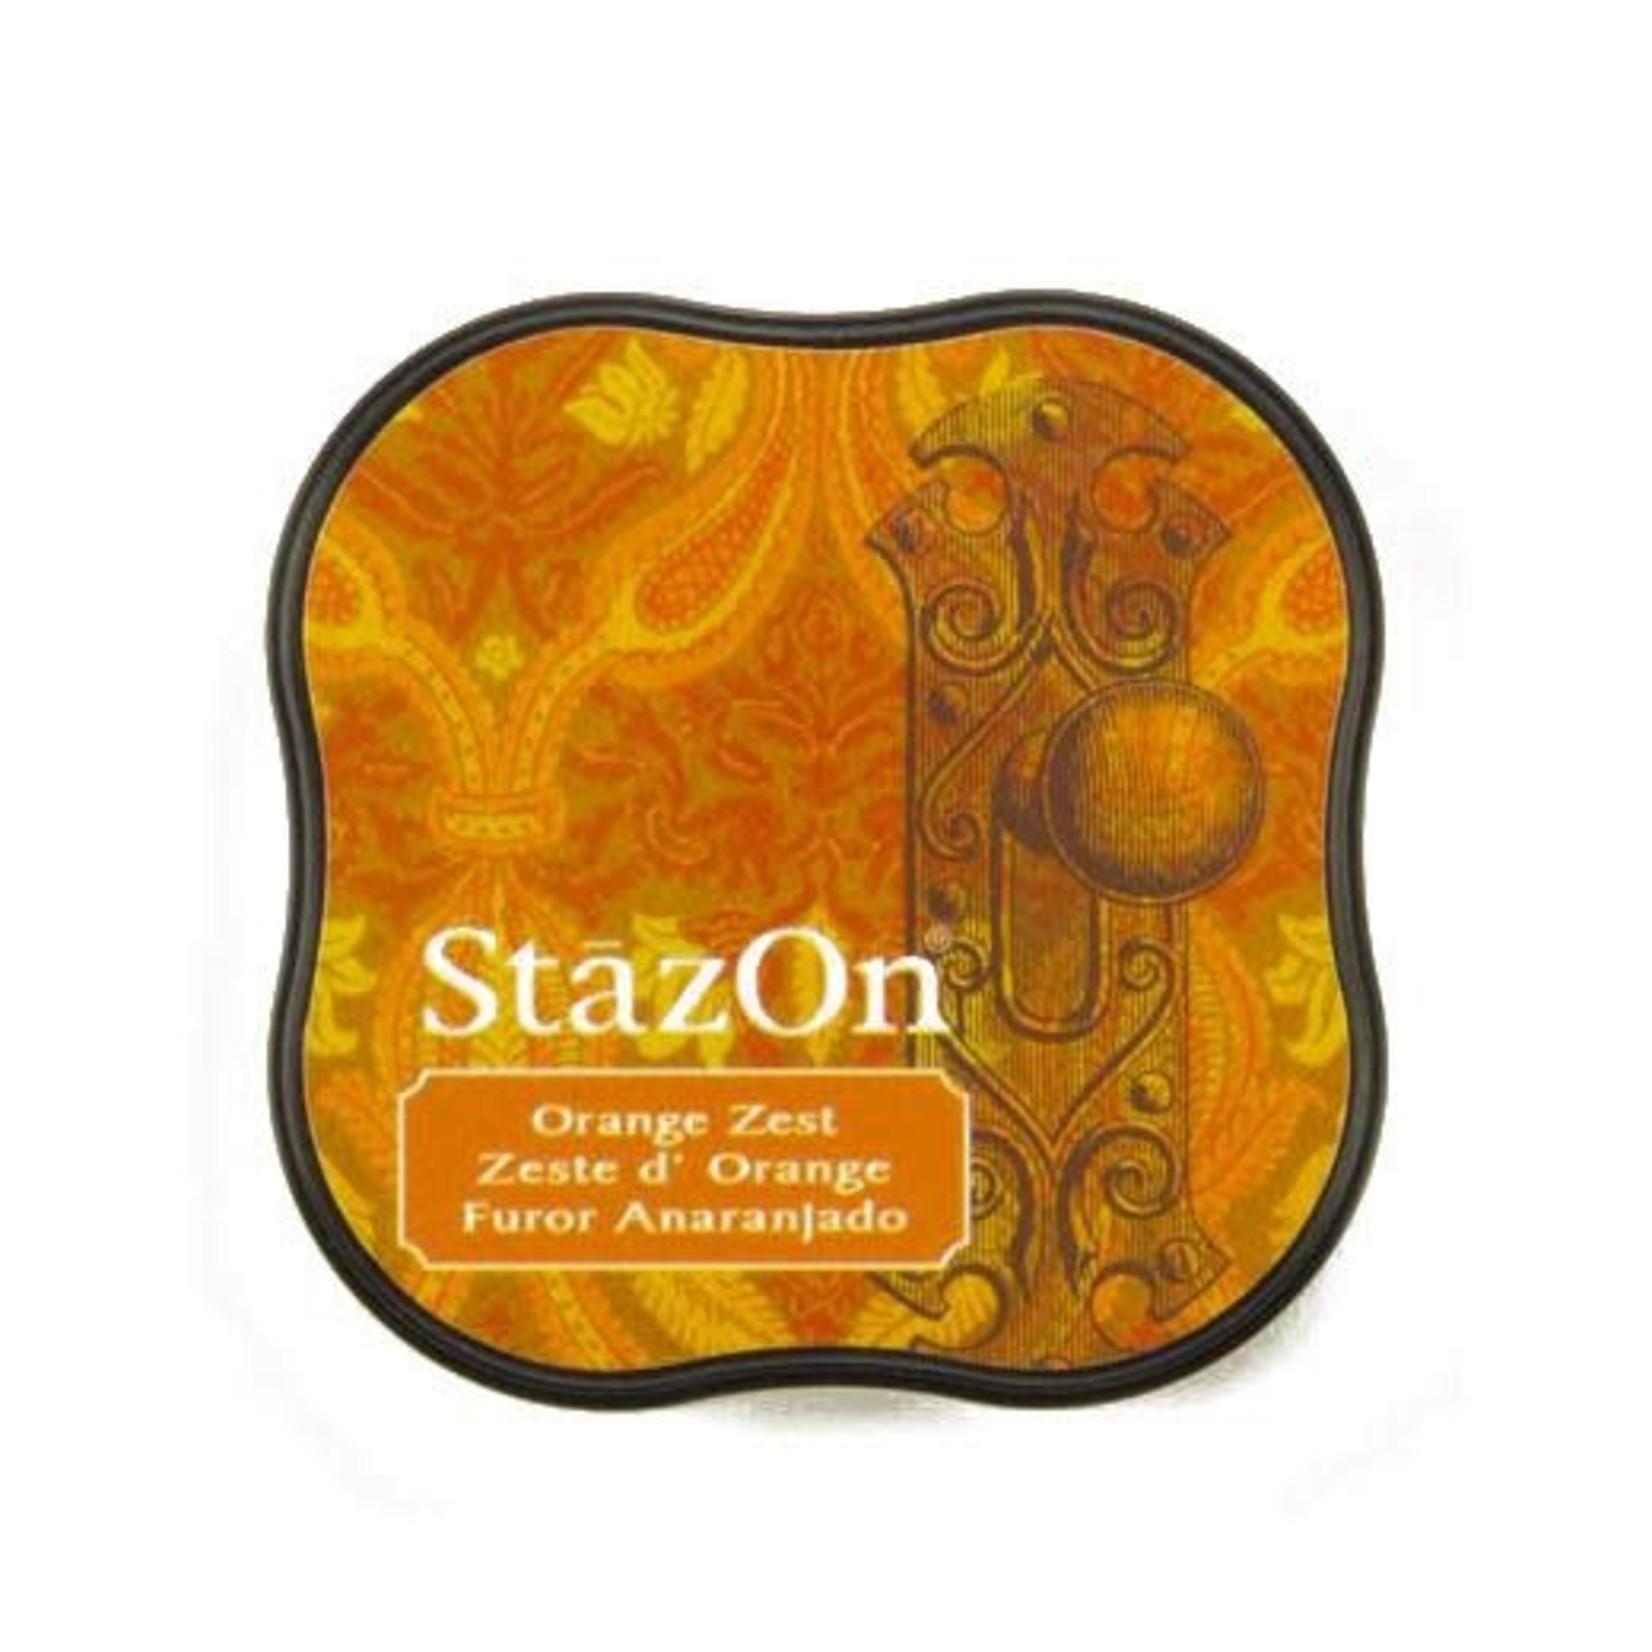 StazOn StazOn Orange Zest